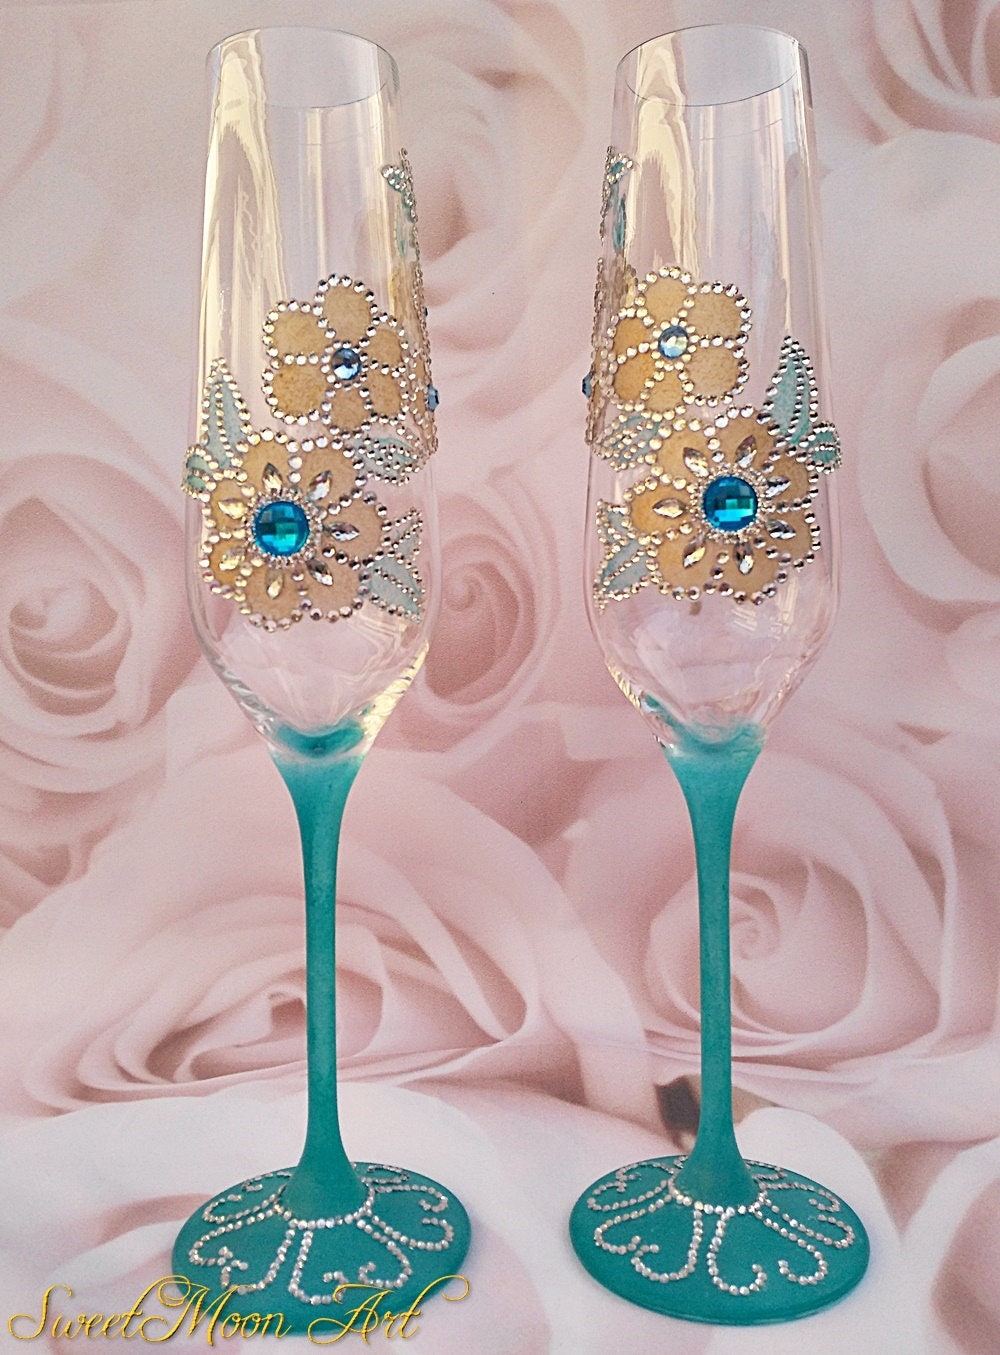 Flautas Champagne Flautas Brindis Boda Copas Celebraciones # Champagne Muebles Uy